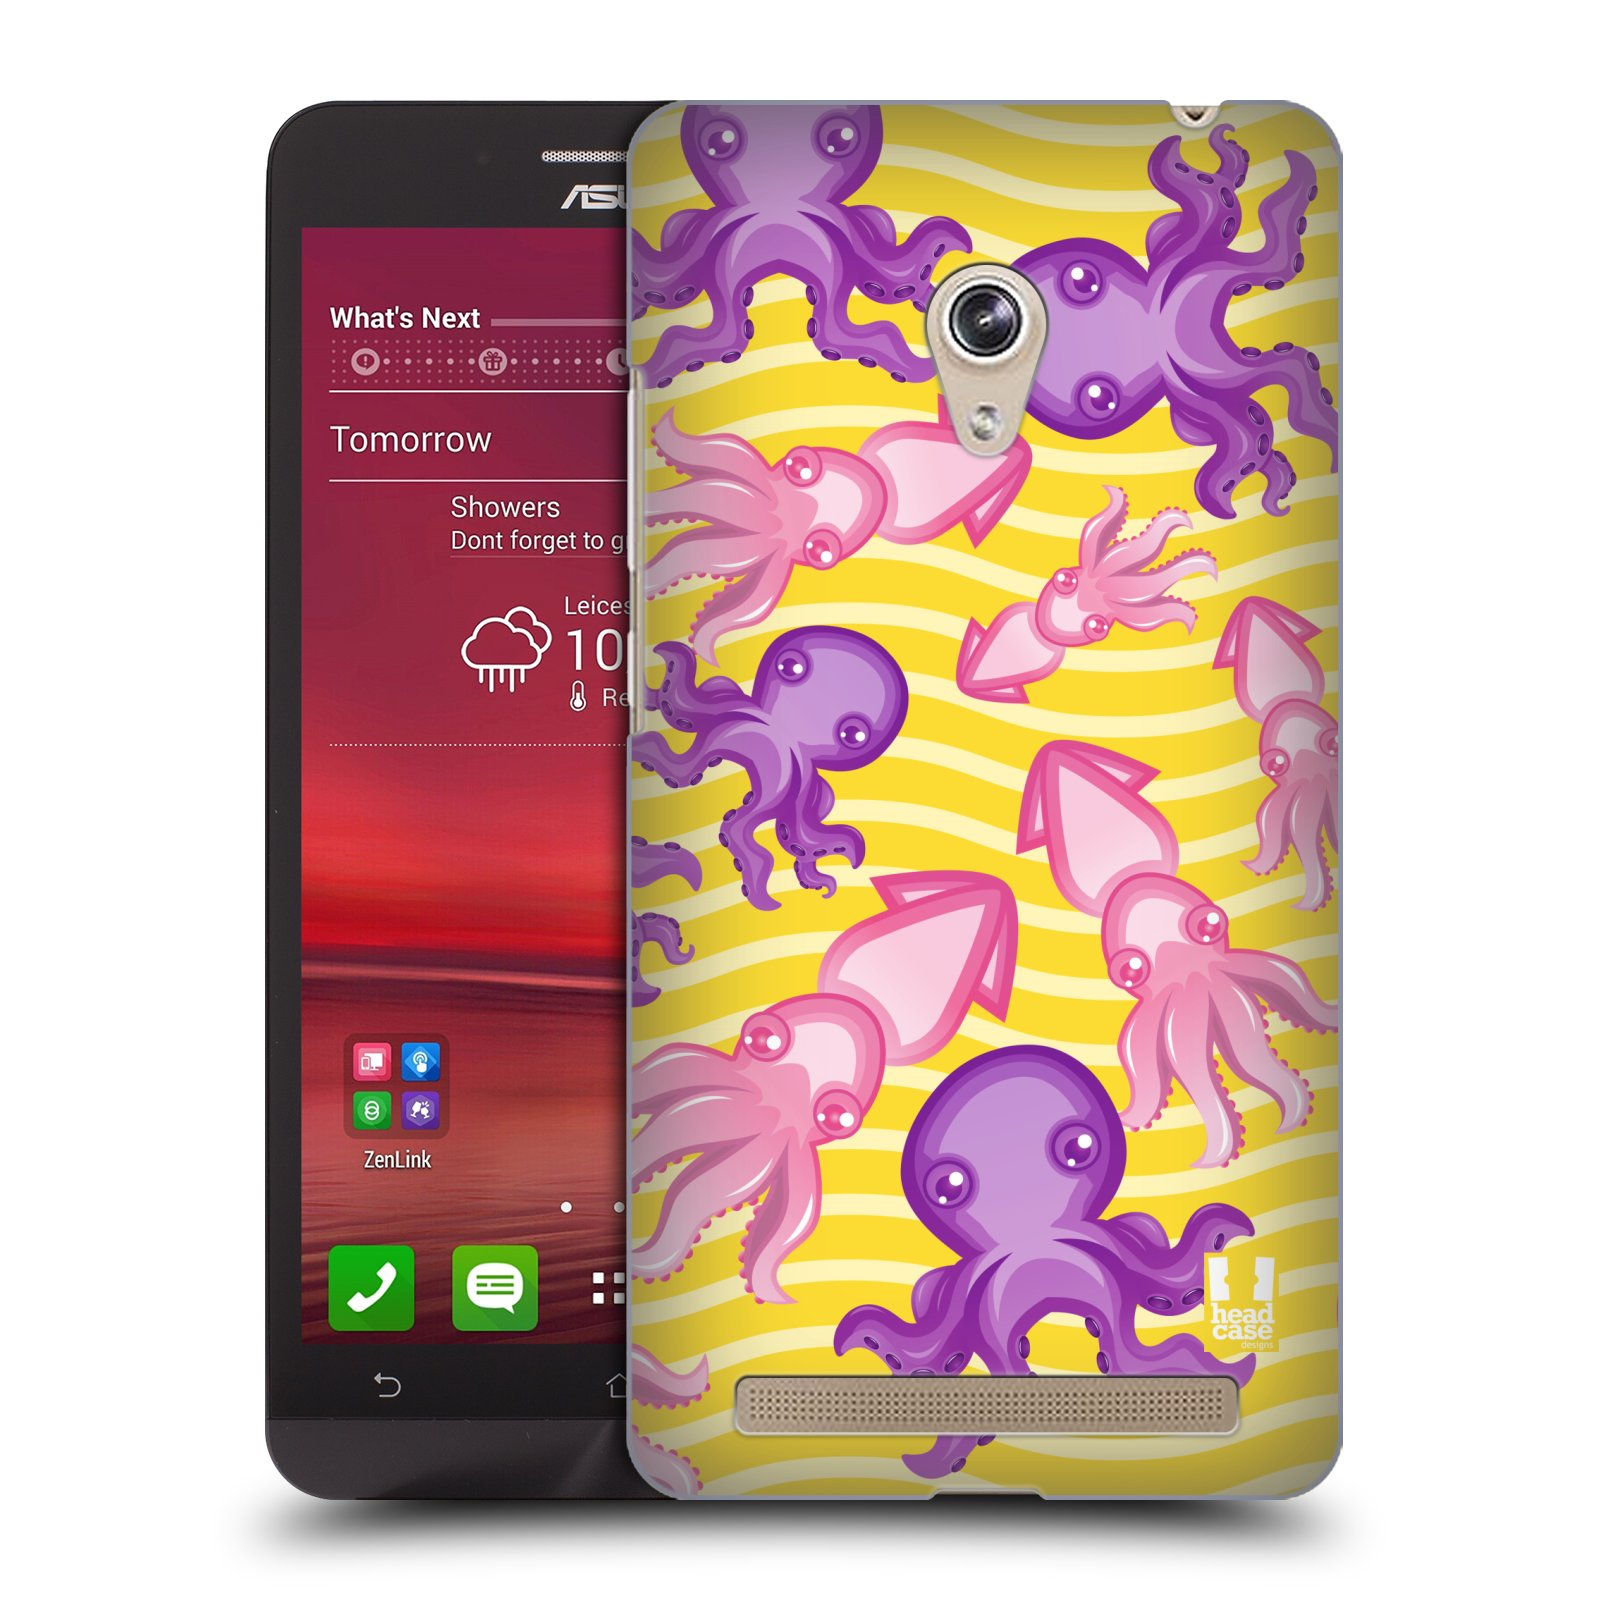 HEAD CASE plastový obal na mobil Asus Zenfone 6 vzor mořský živočich chobotnice